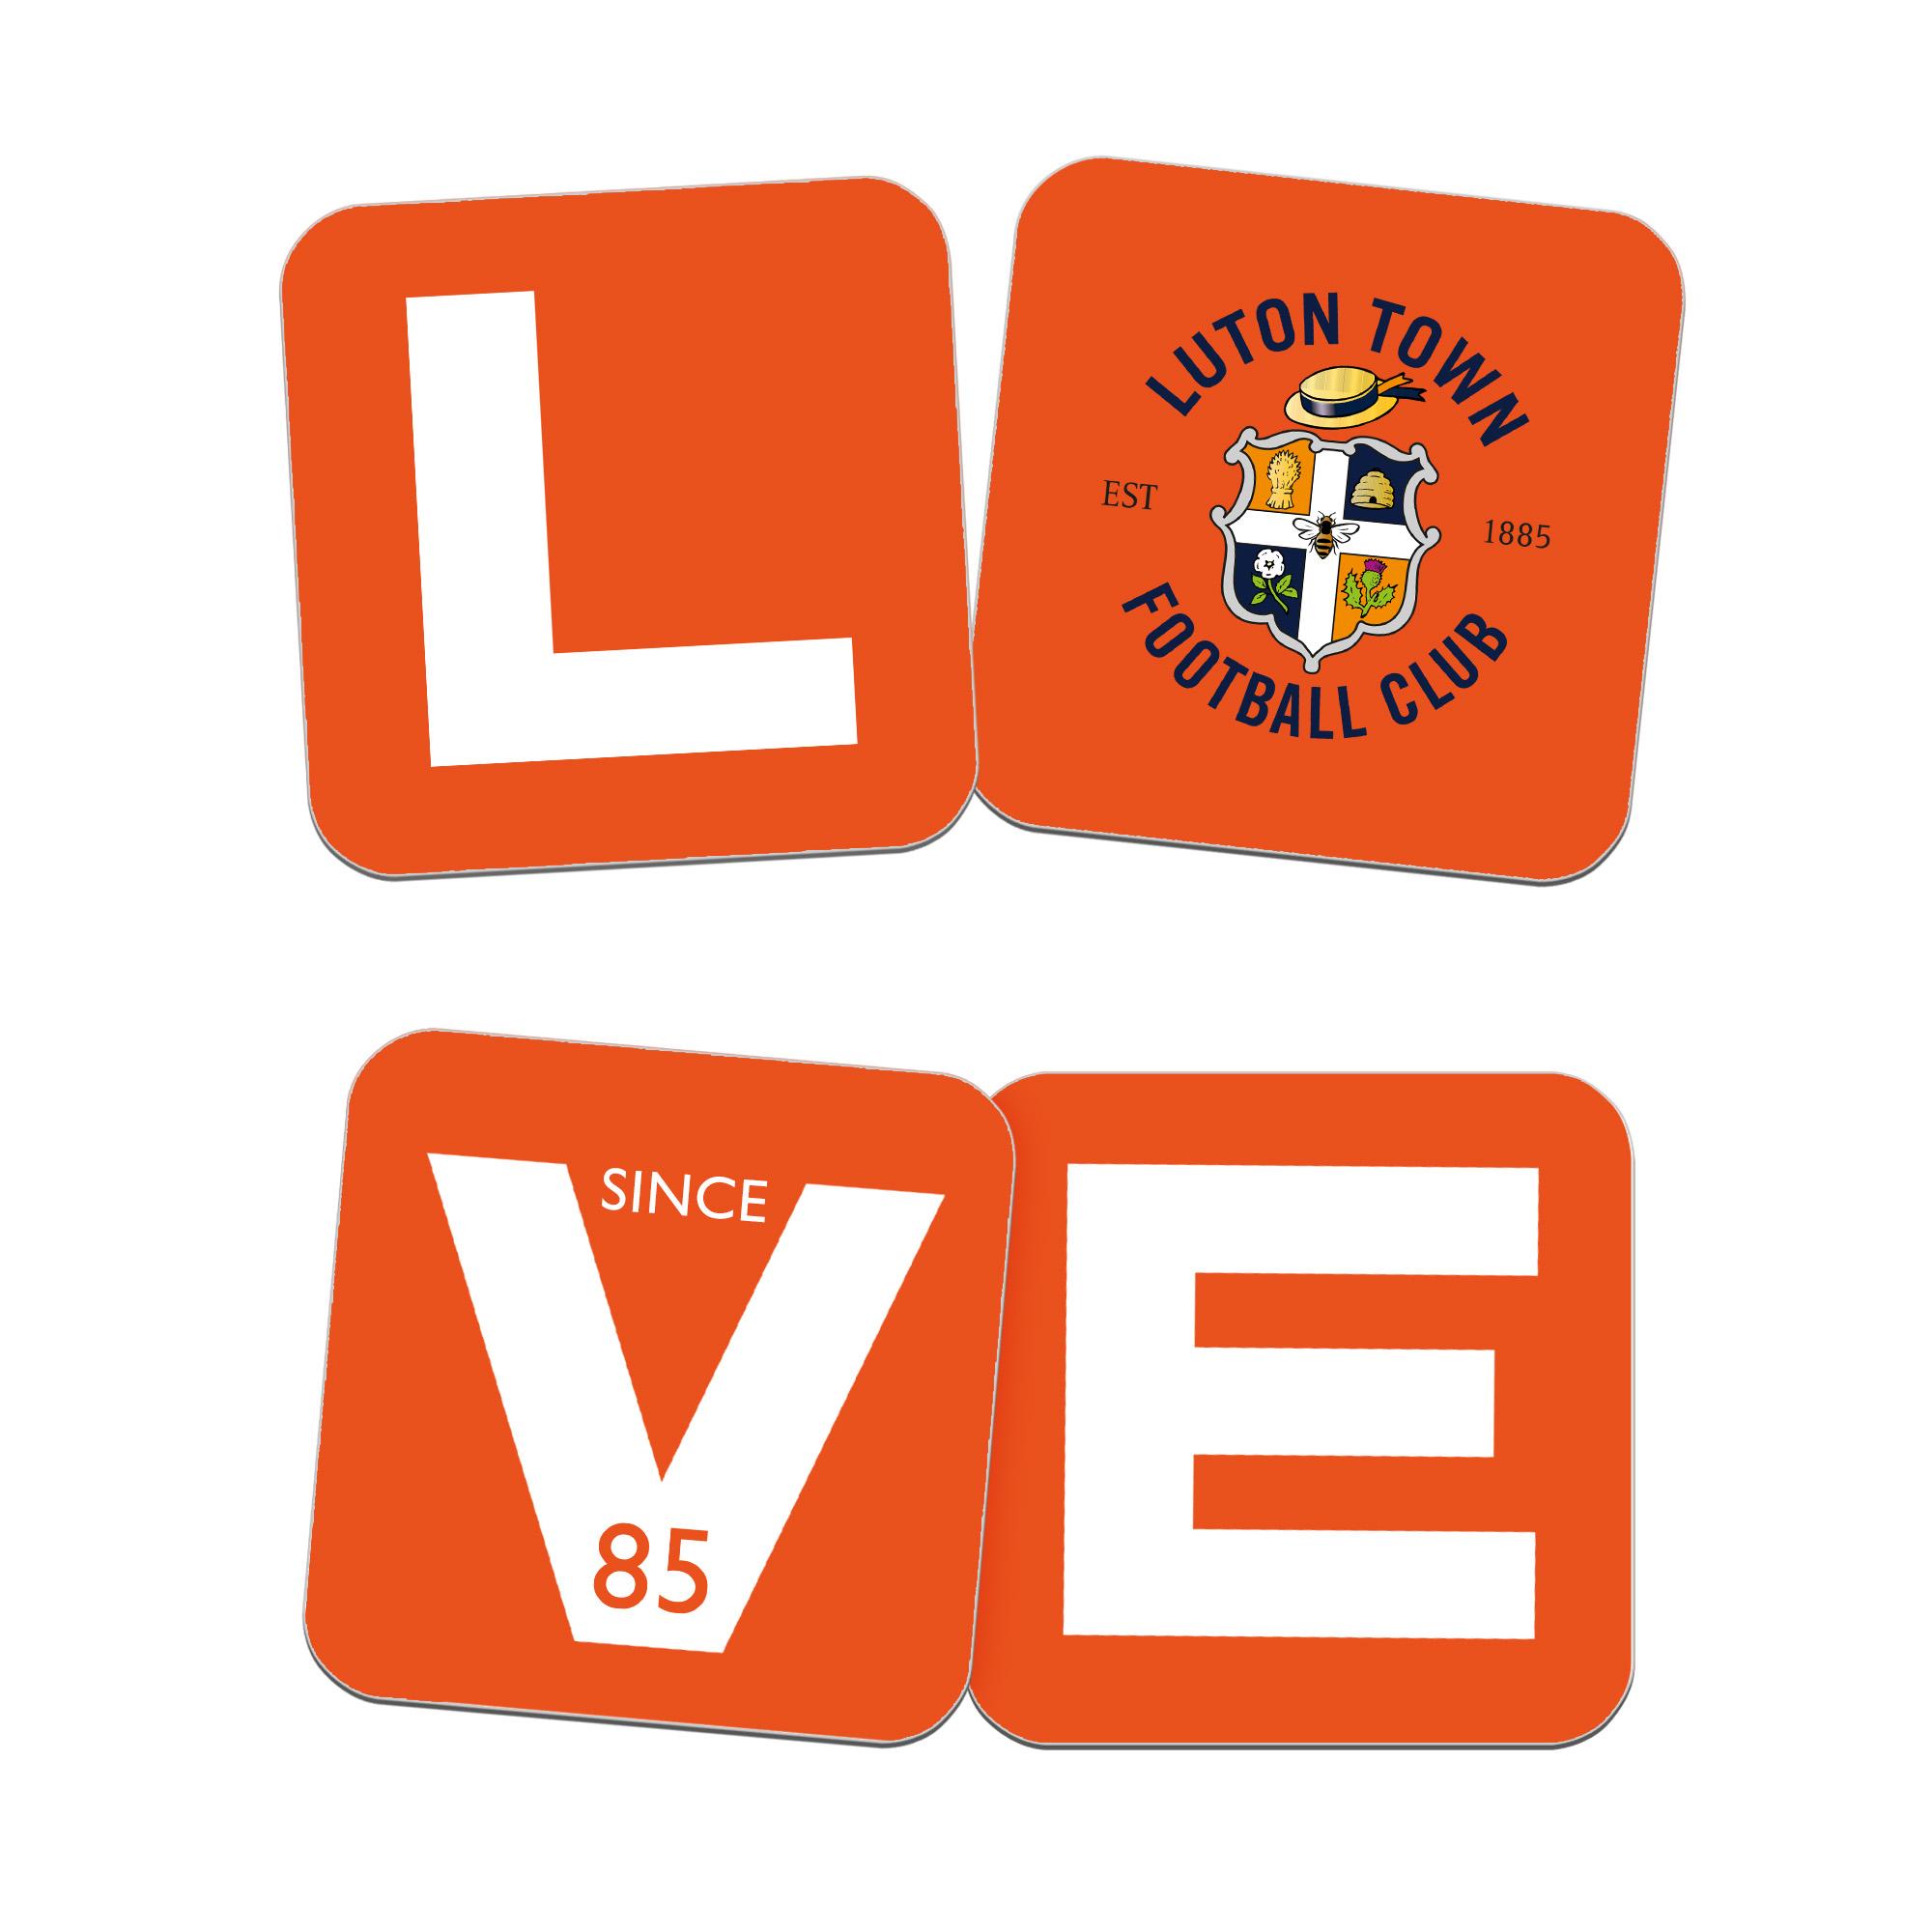 Luton Town FC Love Coasters (x4)